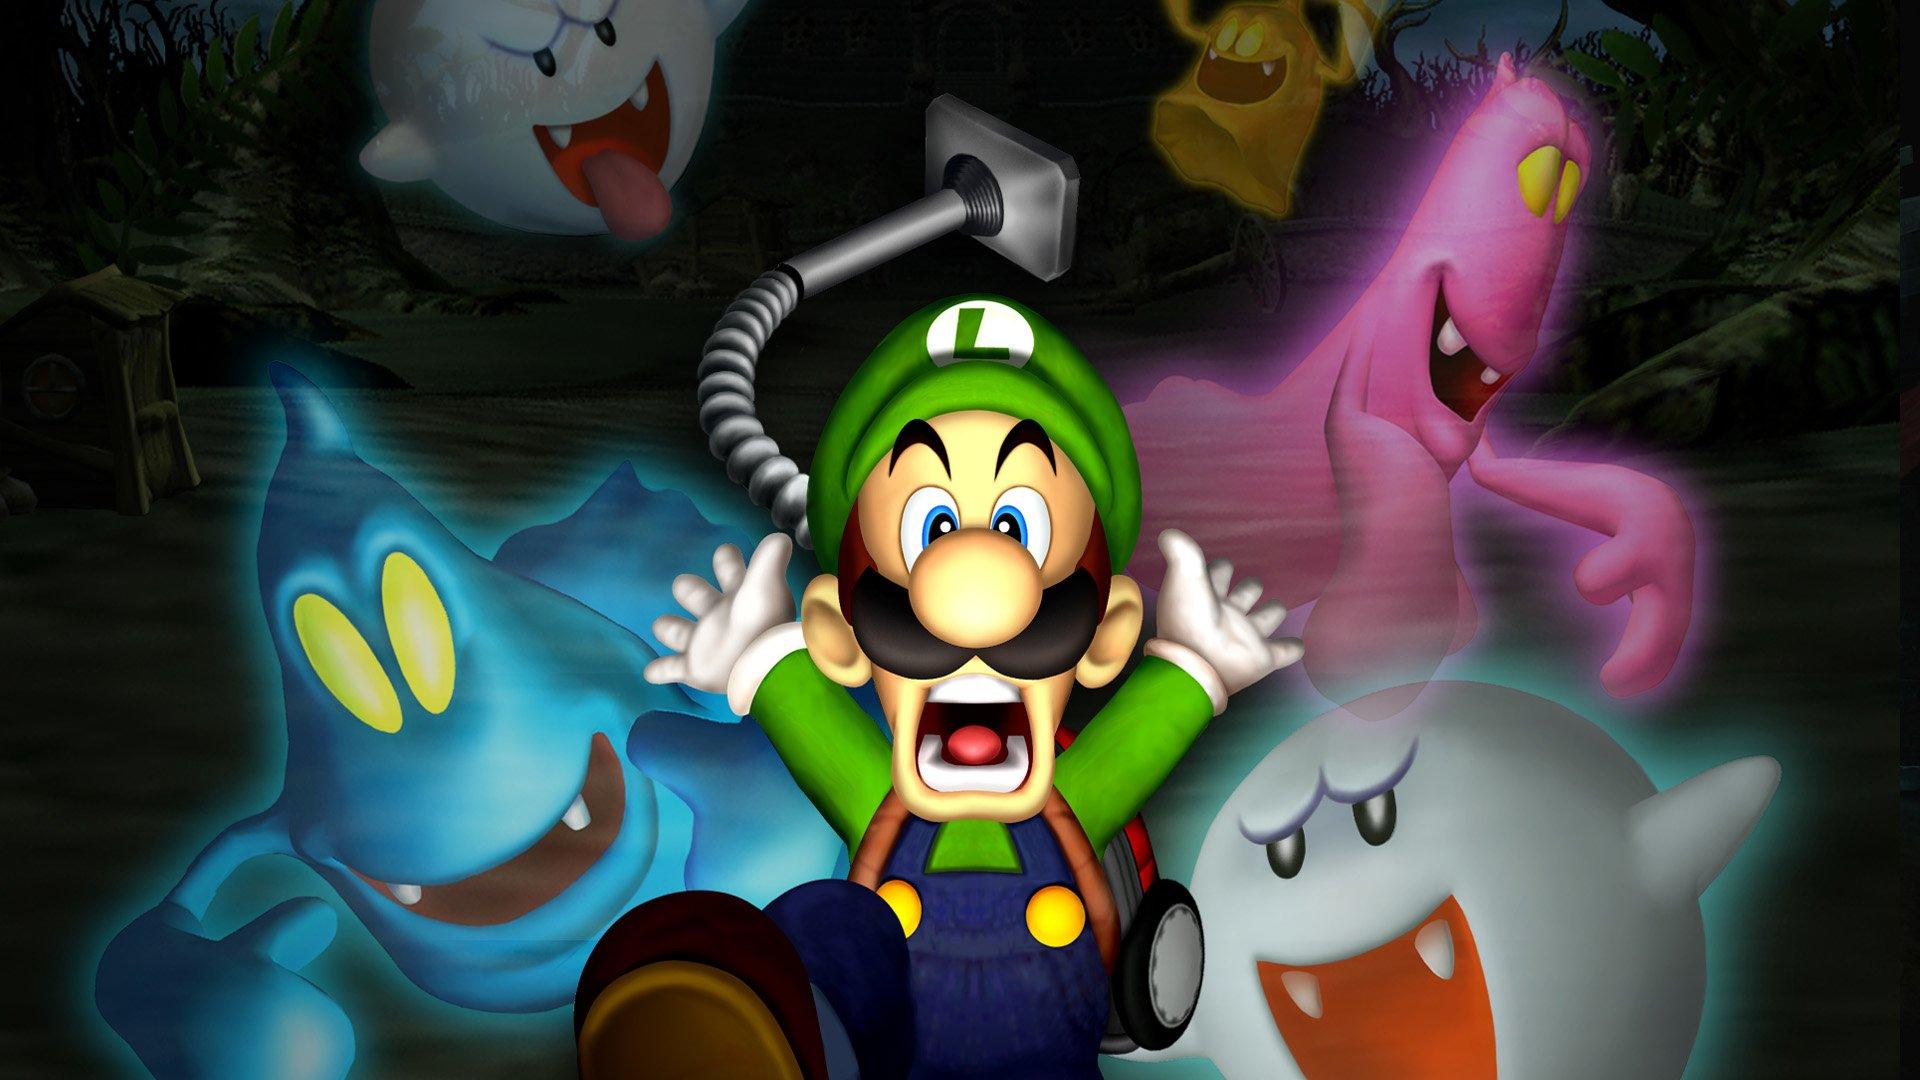 HD Wallpaper | Background Image ID:618160. 1920x1080 Video Game Luigi's Mansion